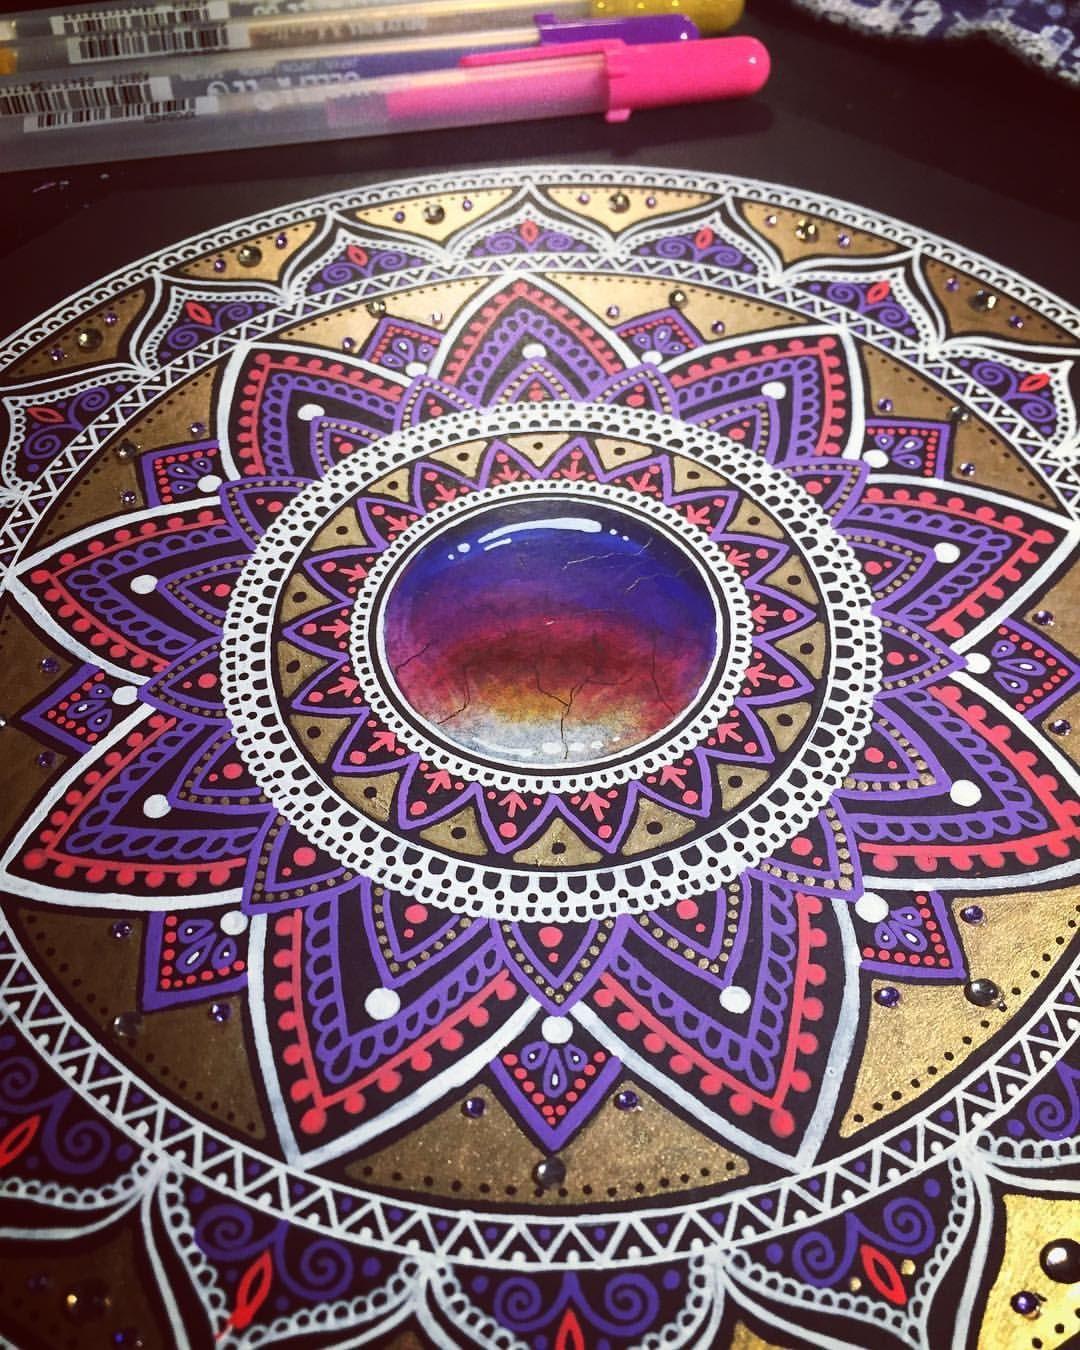 623 Likes 15 Comments Kat Kat Dunlop On Instagram Metallic Mandala Gold Prismacolor Prismacolorpencils Mandala M Mandala Doodle Mandalas Farben